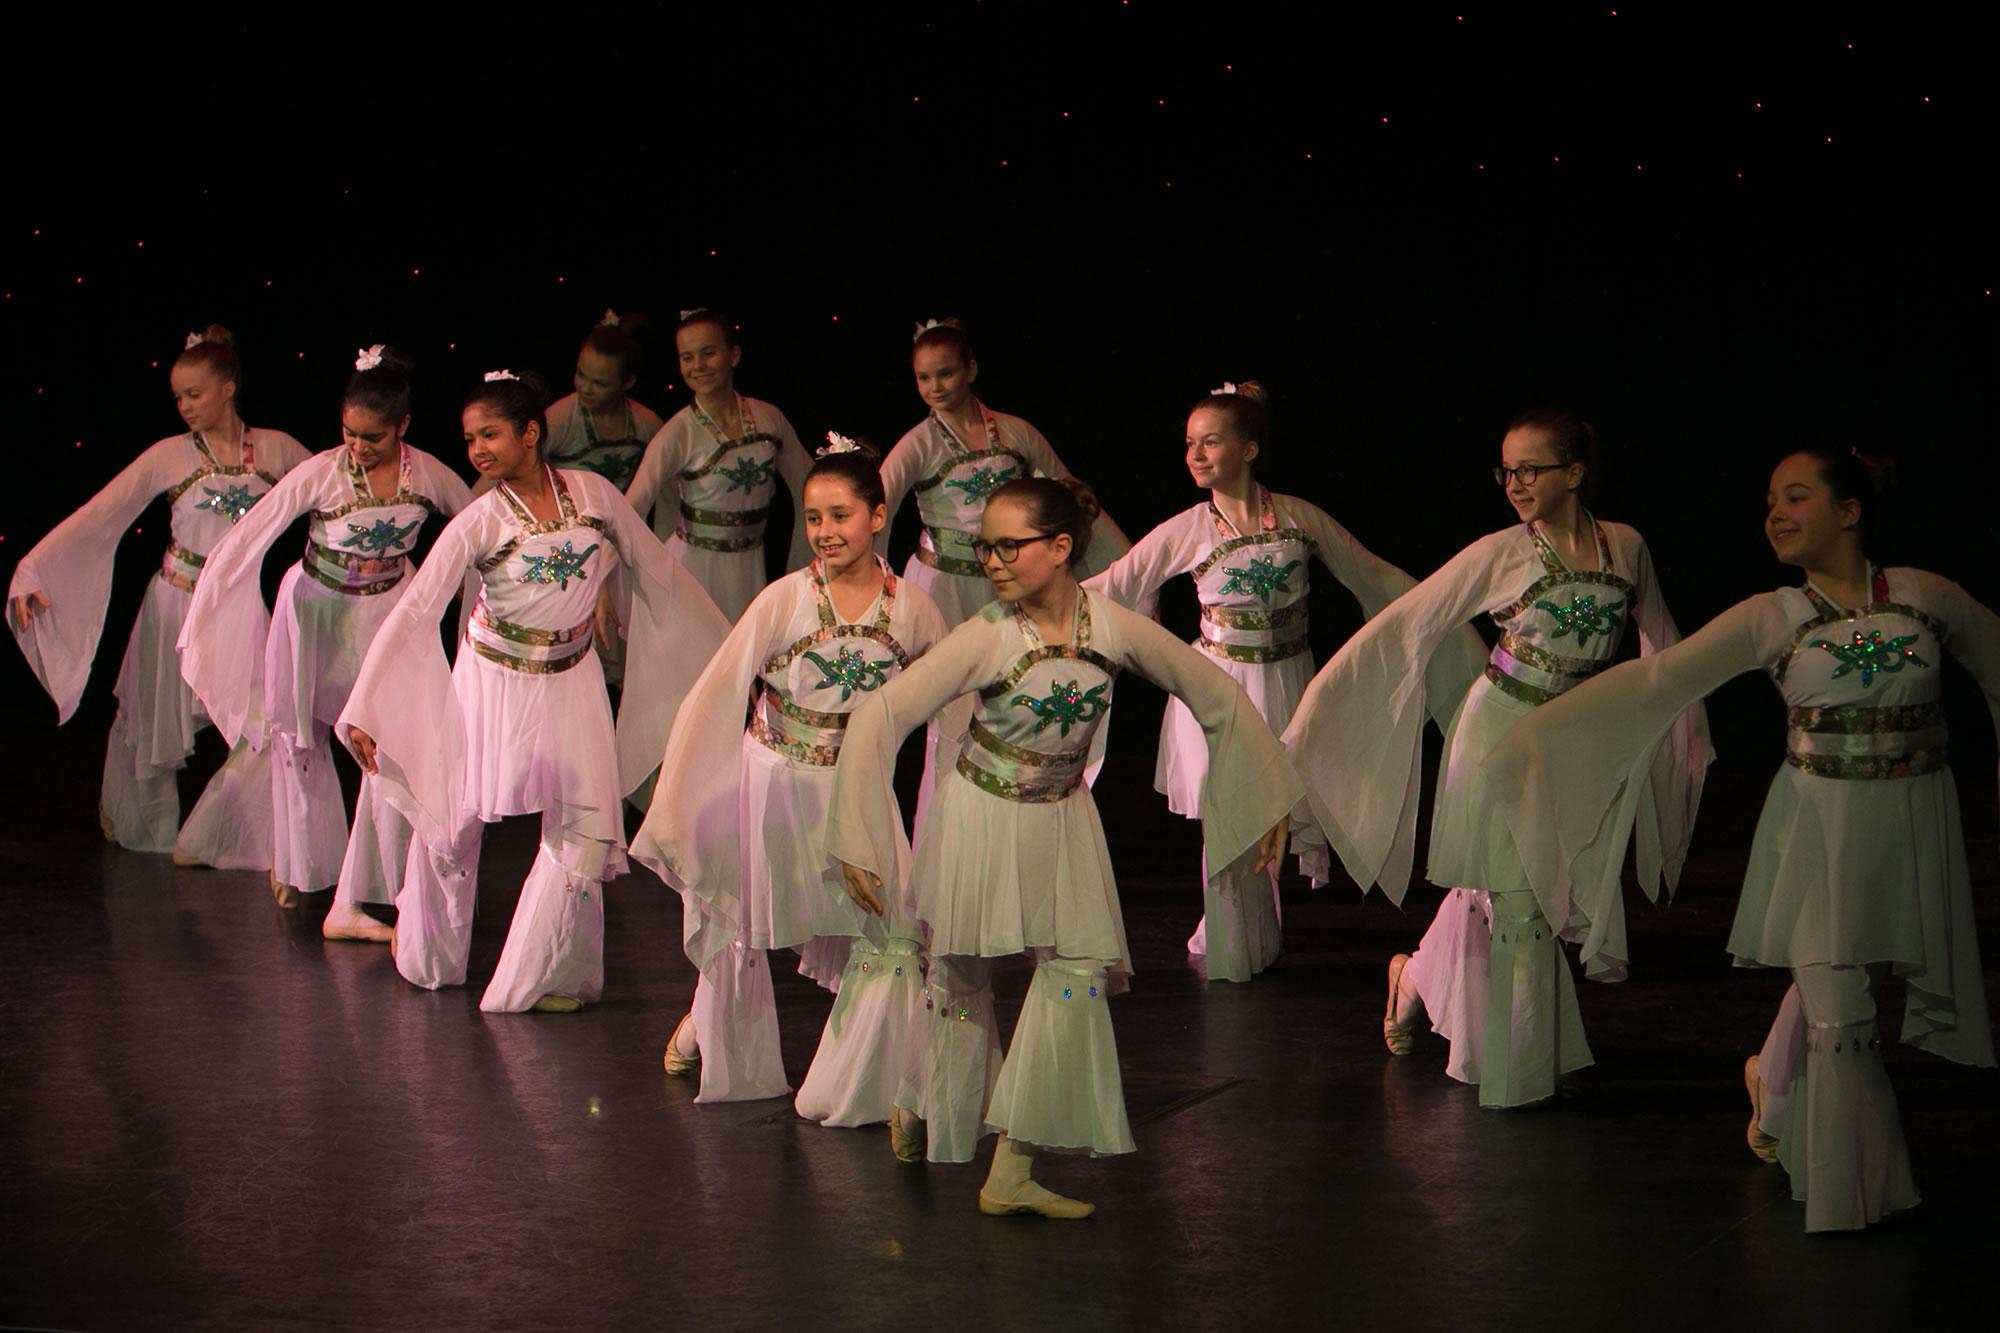 Hitchin_School_of_Dance_Show_2019-SM1_2498.jpg